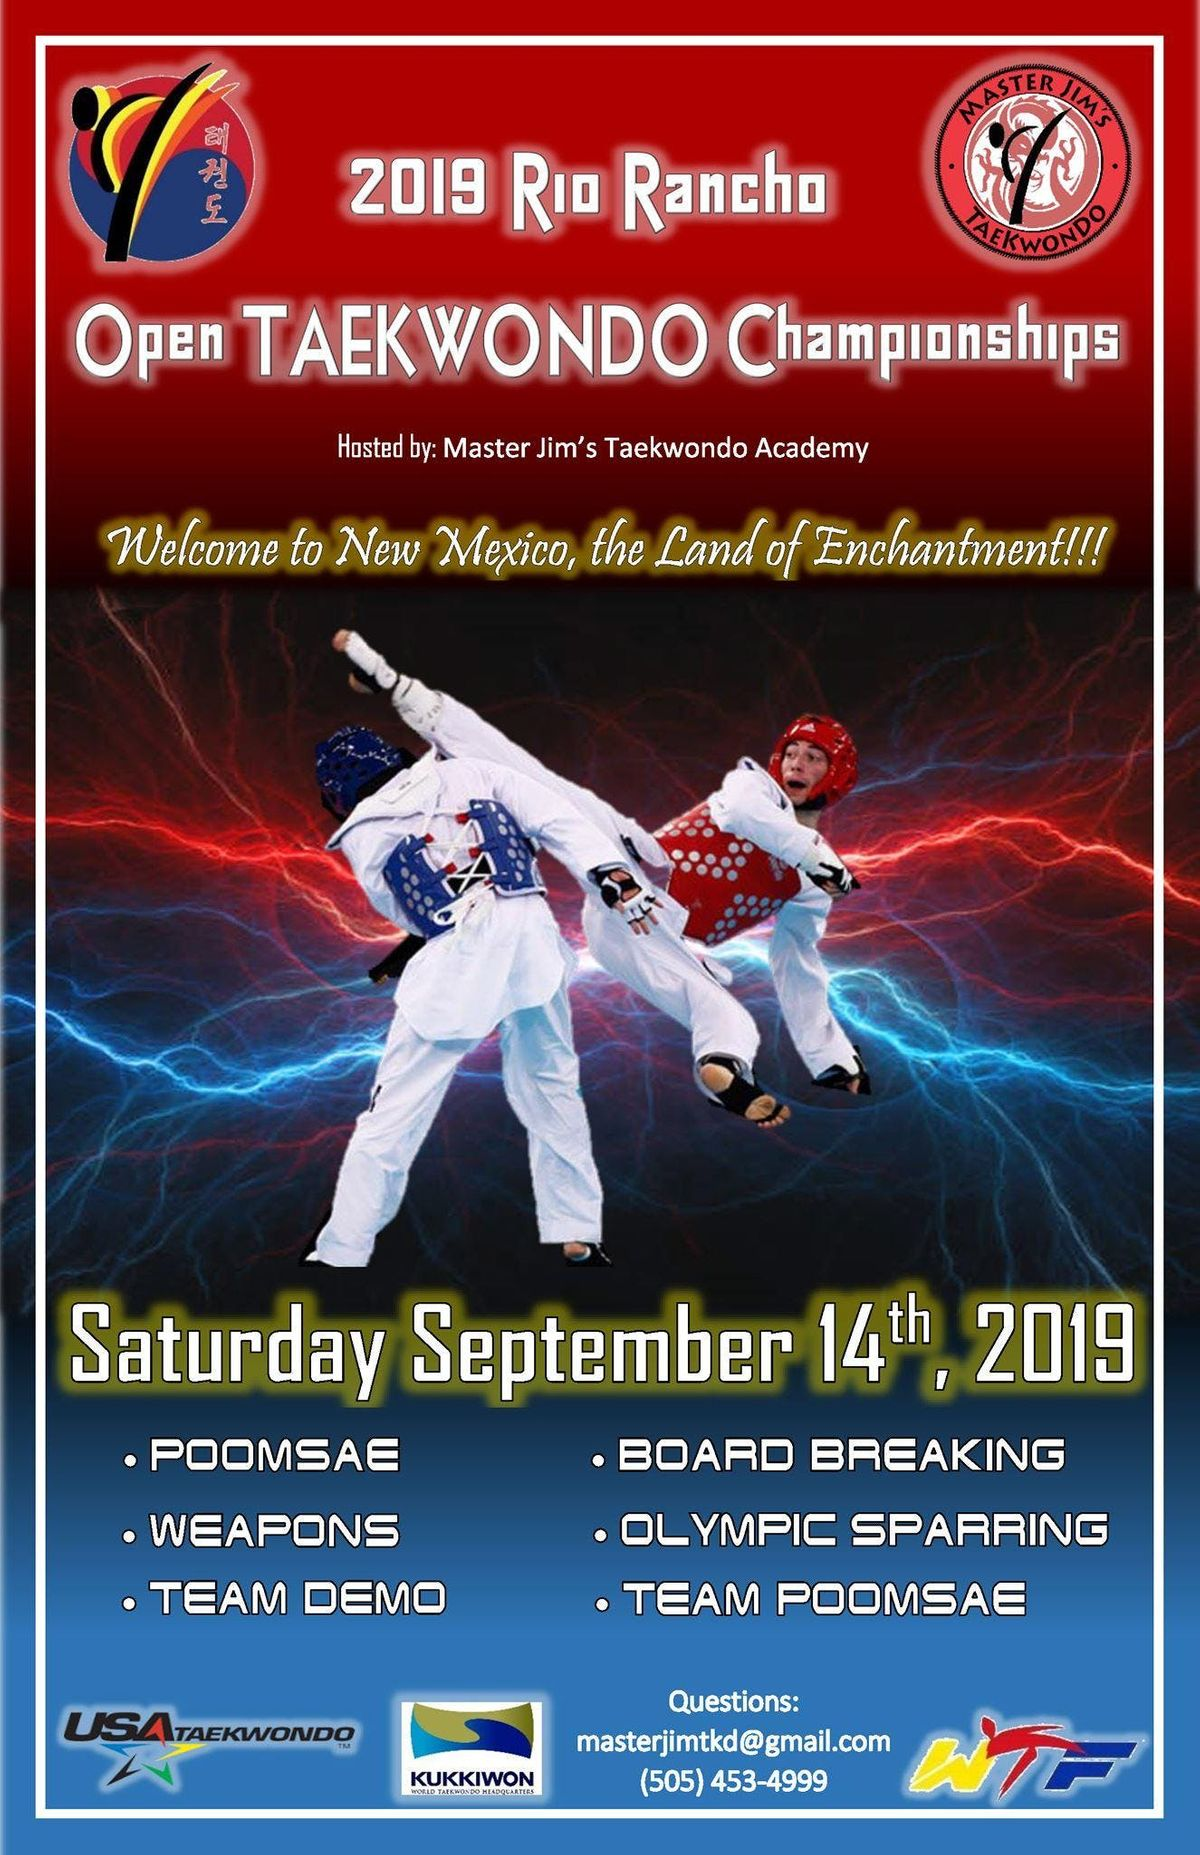 JSKA International Open Karate Championship events in the